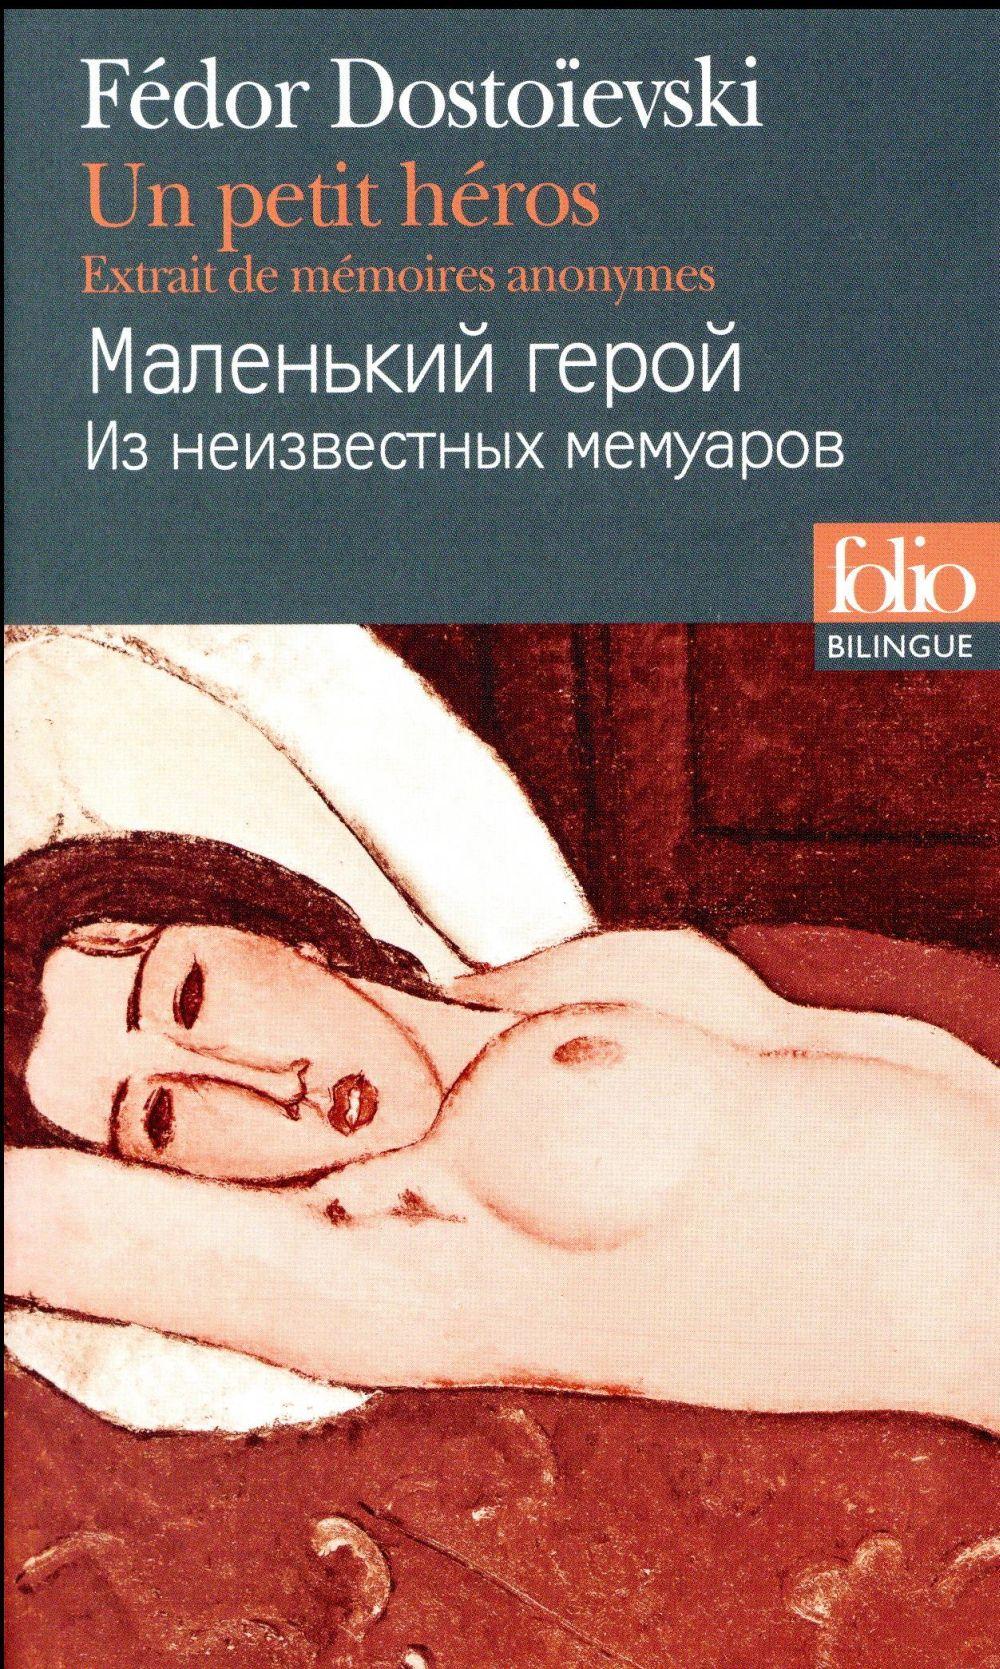 UN PETIT HEROS EXTRAIT DE MEMOIRES ANONYMES DOSTOEVSKIJ F M. Gallimard